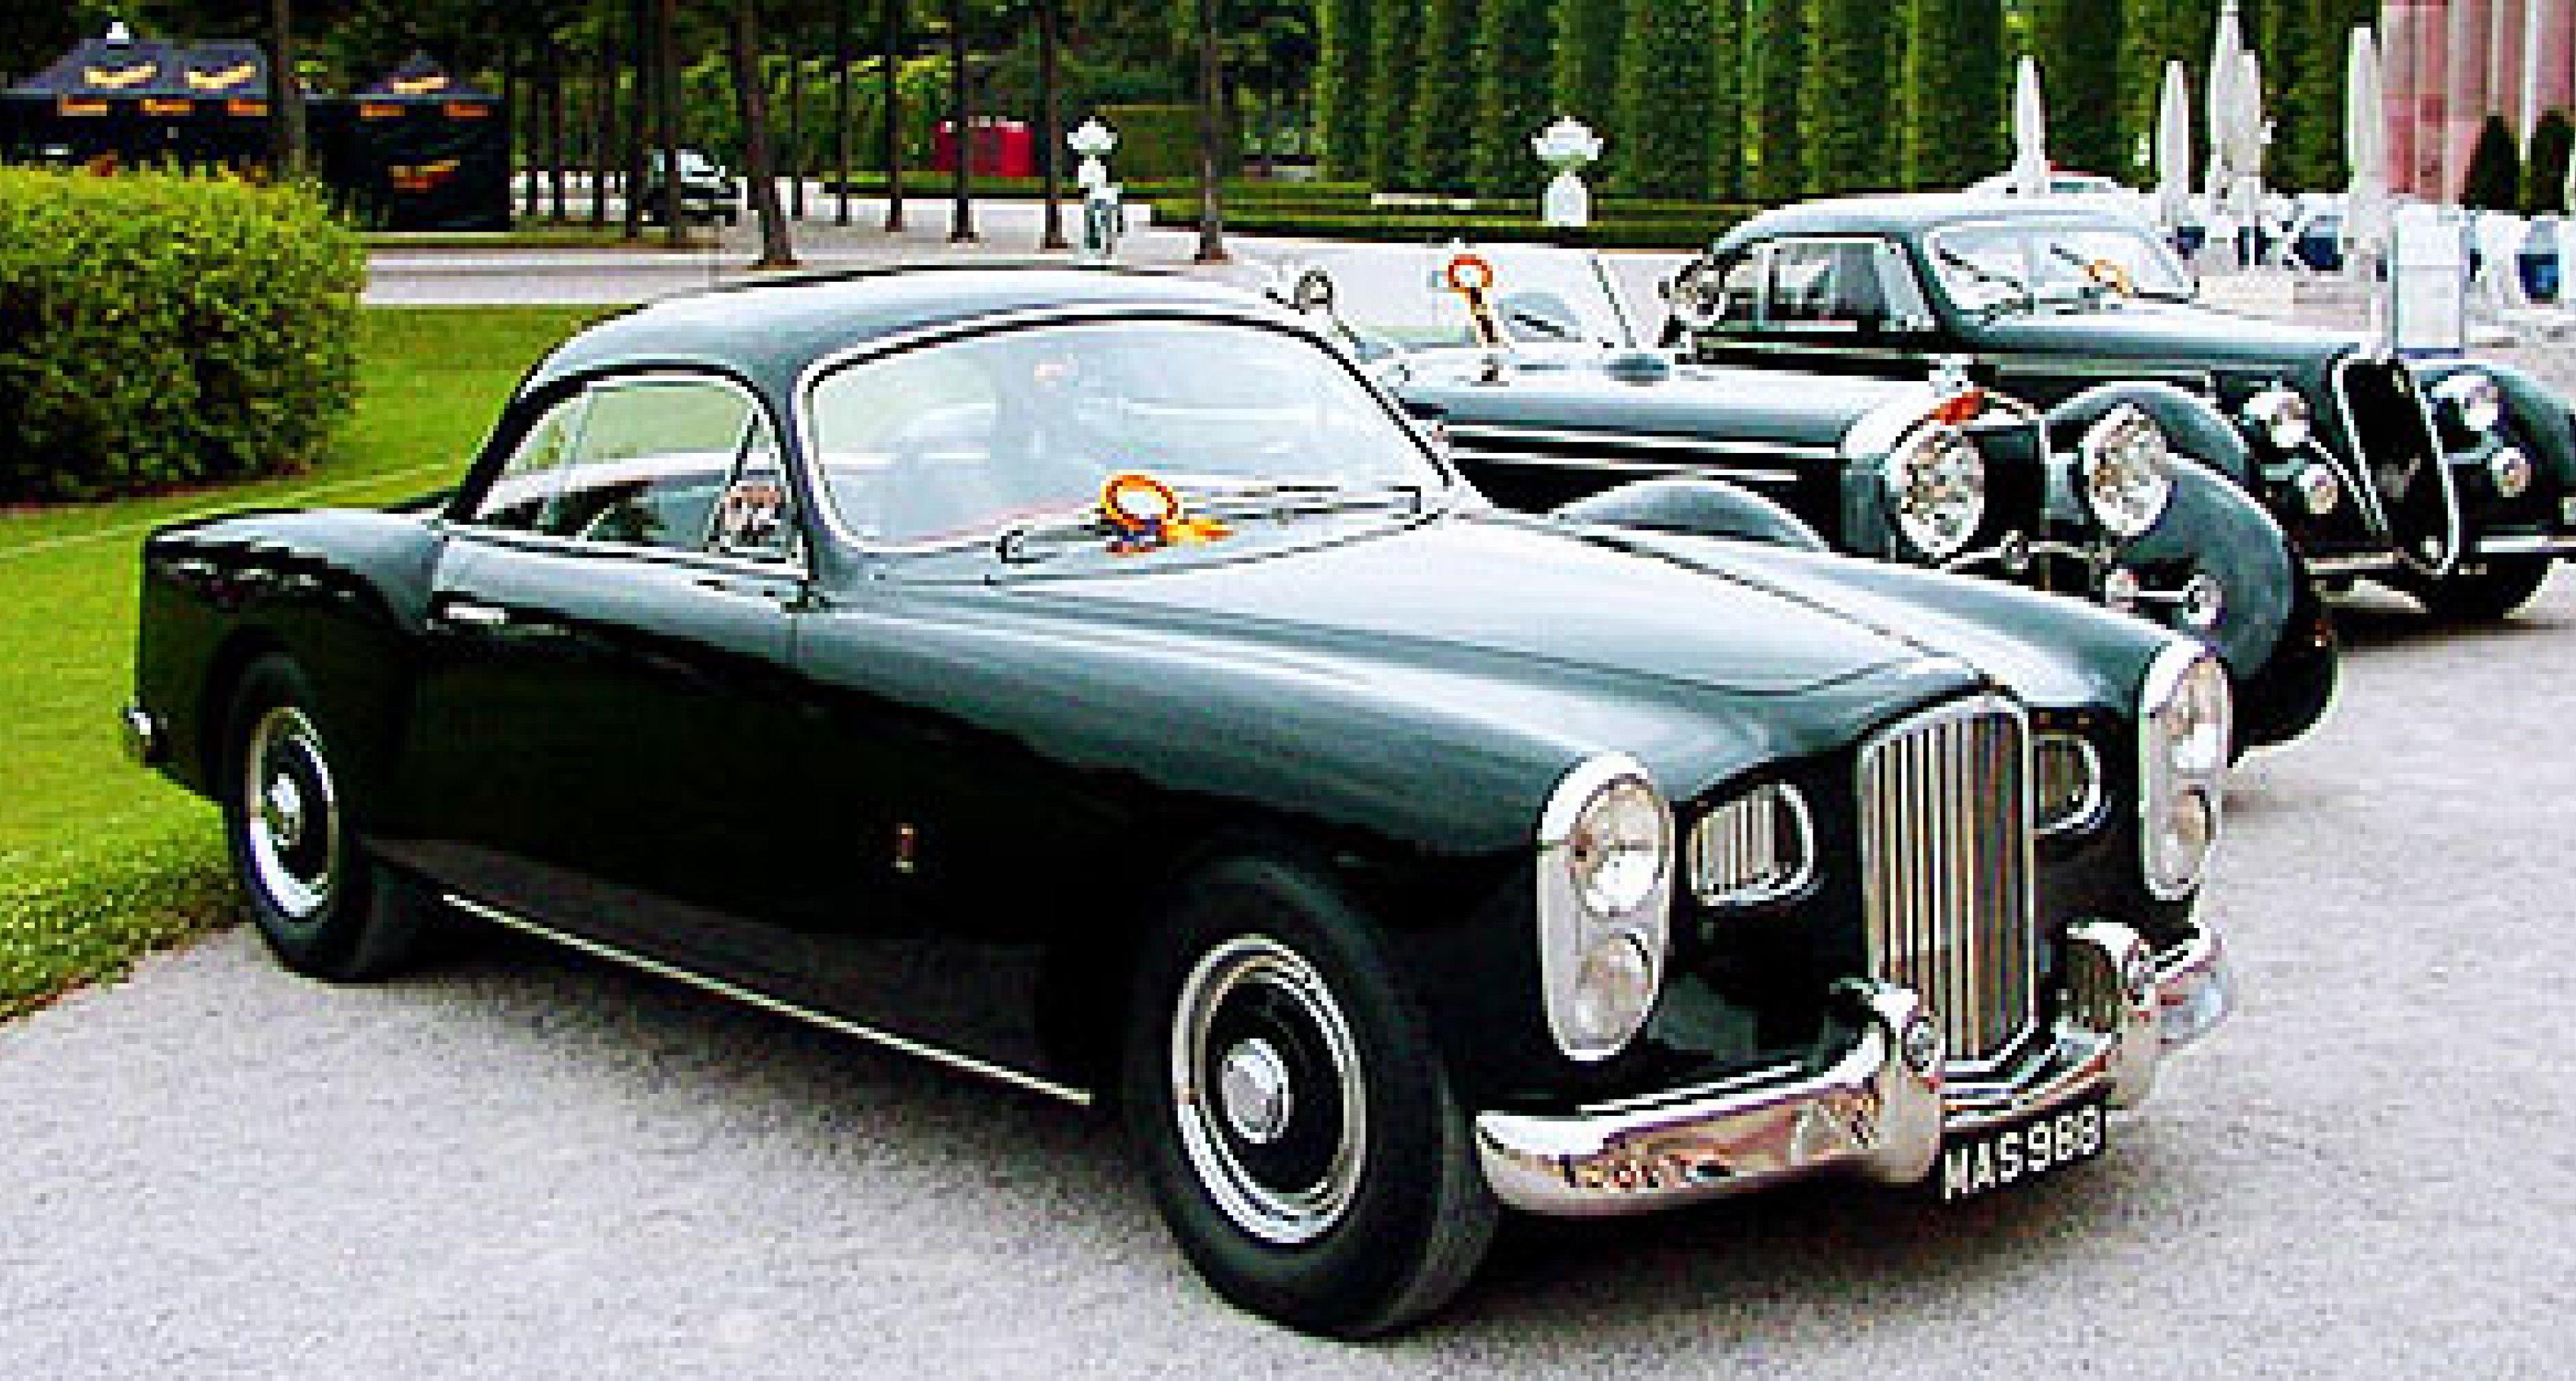 4. Internationaler Concours d'Elegance Oldtimer-Gala Schwetzingen